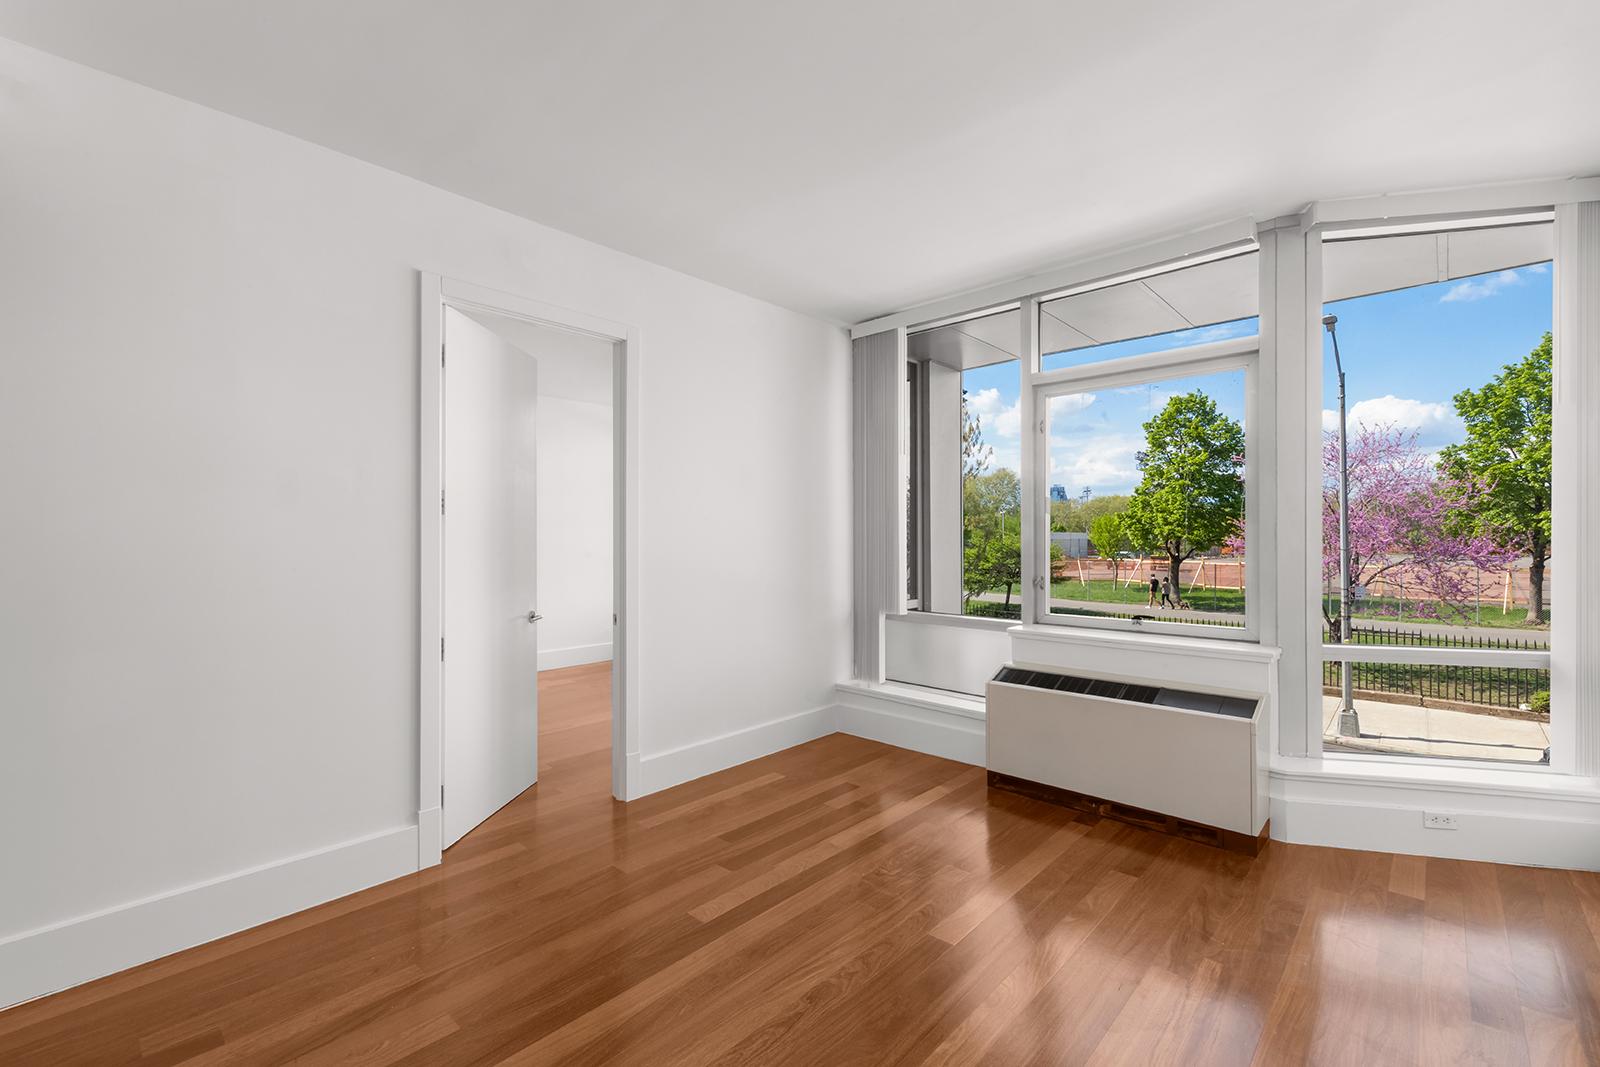 30 Bayard St 2c Brooklyn Ny 11211 Core Real Estate